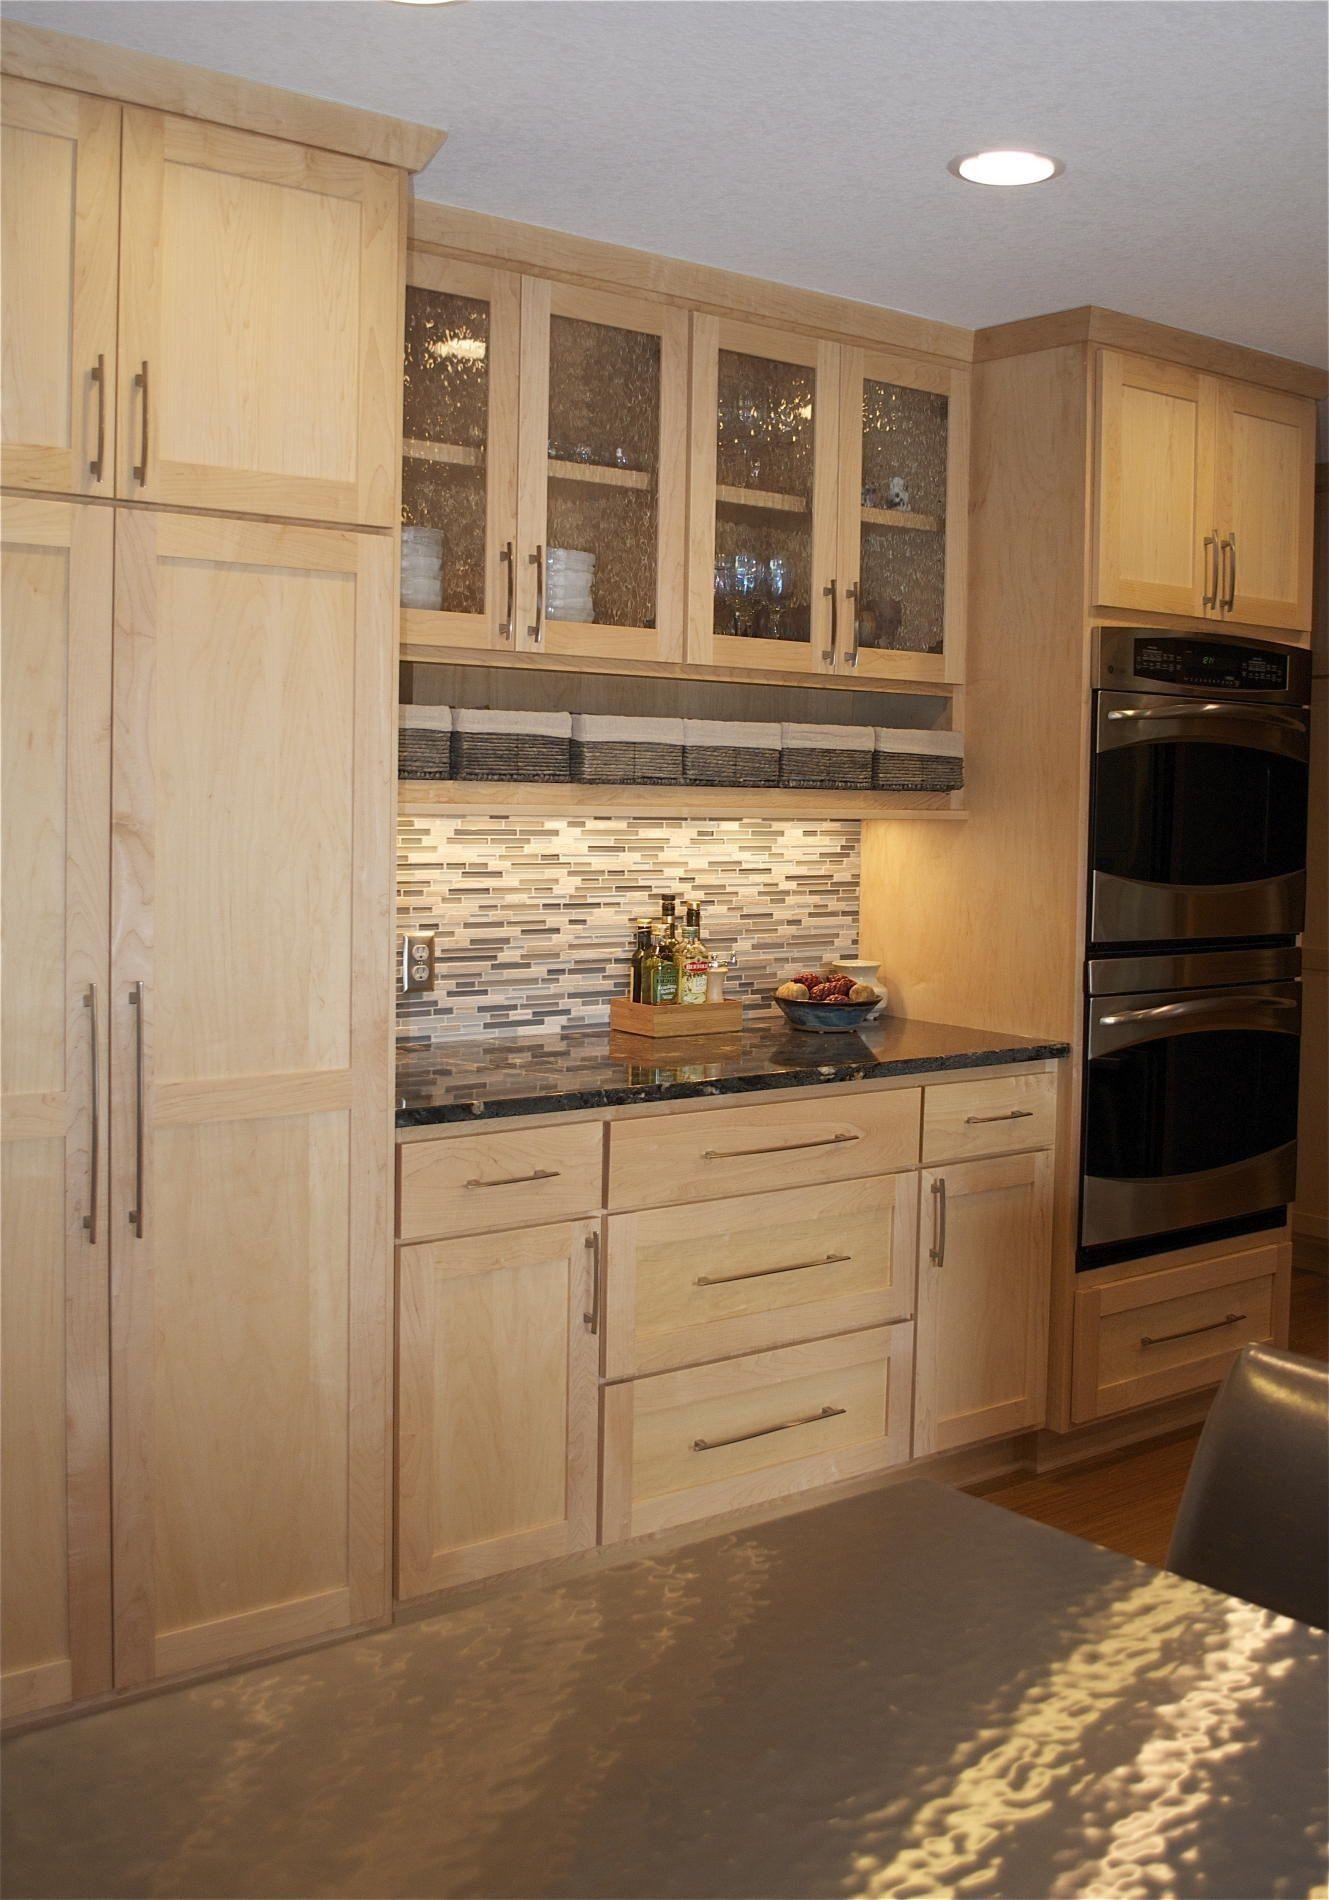 Honey Oak Kitchen Cabinet Wall Color Elegant Light Cabinet Kitchen Ideas Zeppefuturescons In 2020 Wooden Kitchen Cabinets Maple Kitchen Cabinets Kitchen Cabinet Design